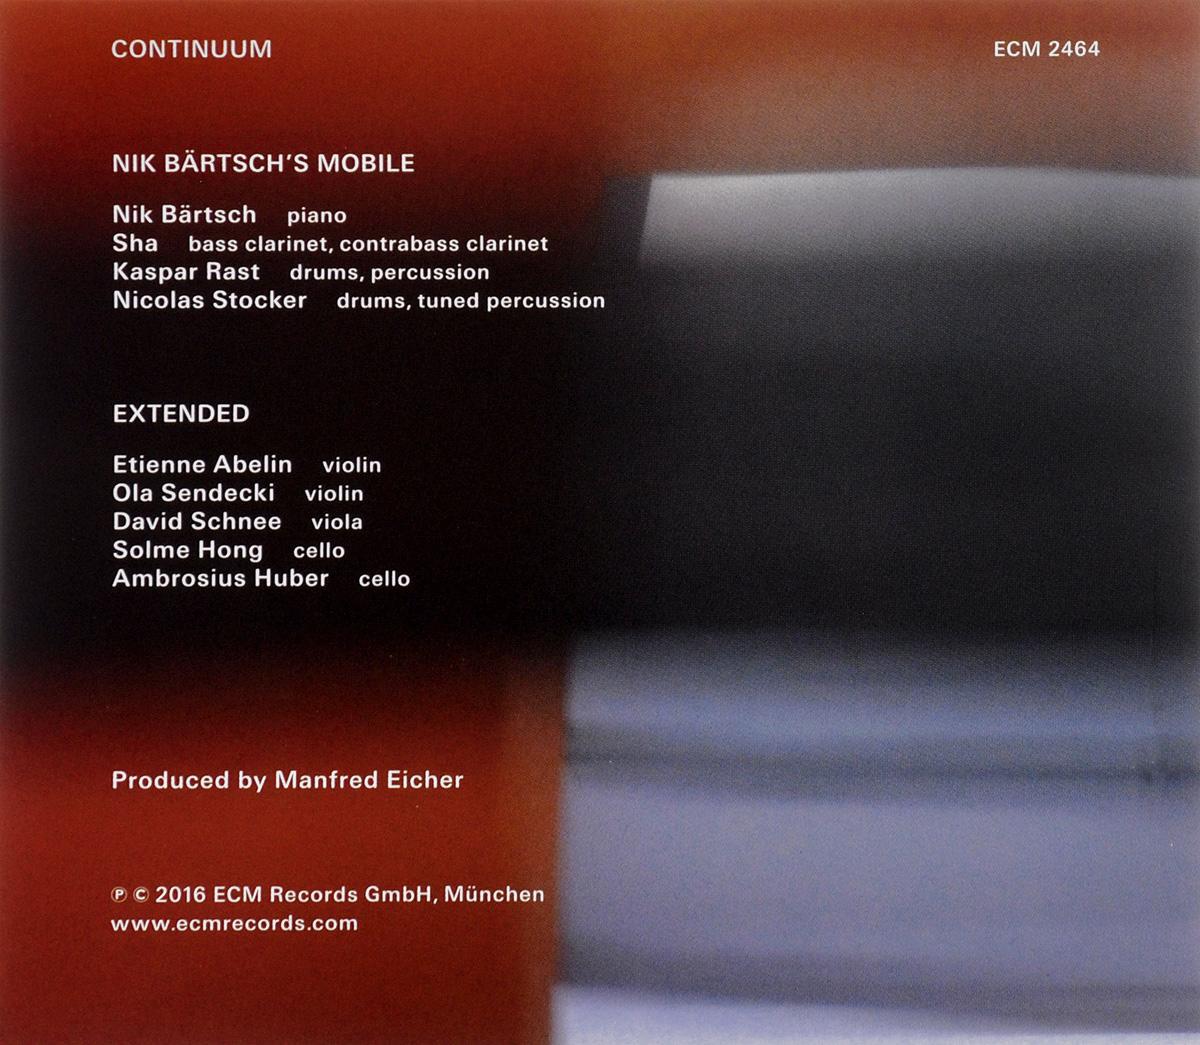 "Nik Bartsch's Mobile. Continuum. ""Nik Bartsch's Mobile"",Etienne Abelin,Ola Sendecki,David Schnee,Solme Hong,Ambrosius Huber"